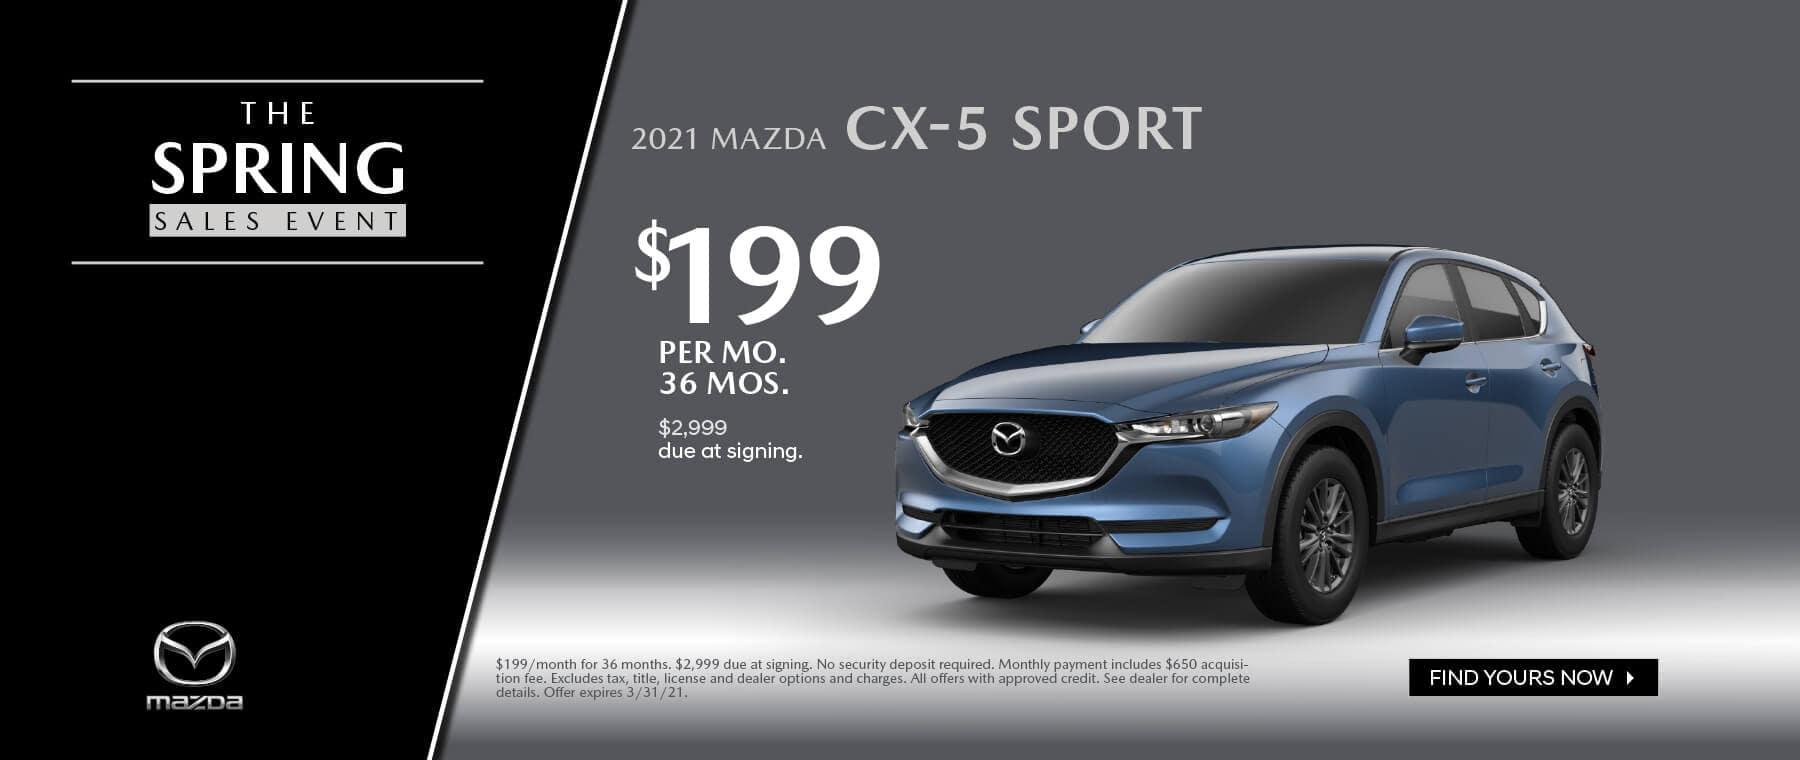 2021.02.24-Keffer-Mazda-MAR-Web-Banners-S51082vw-3